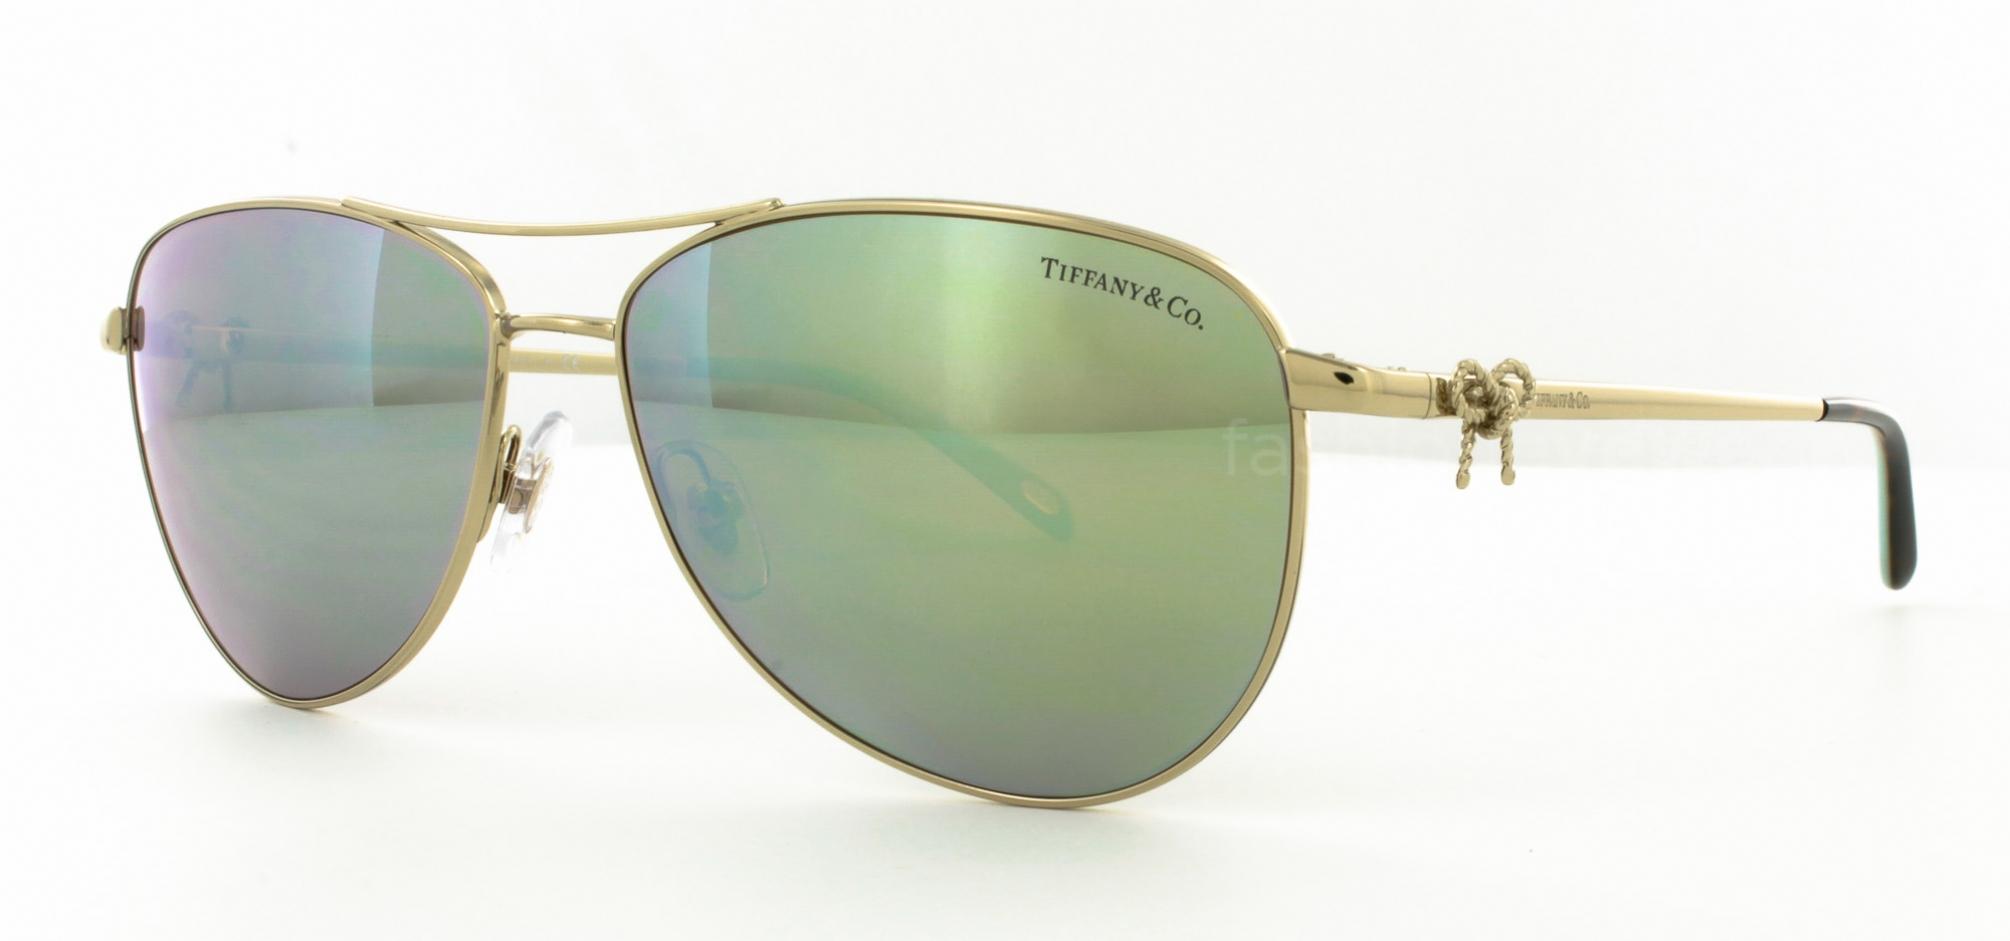 ae2a052c5b86 Tiffany 3044 Sunglasses